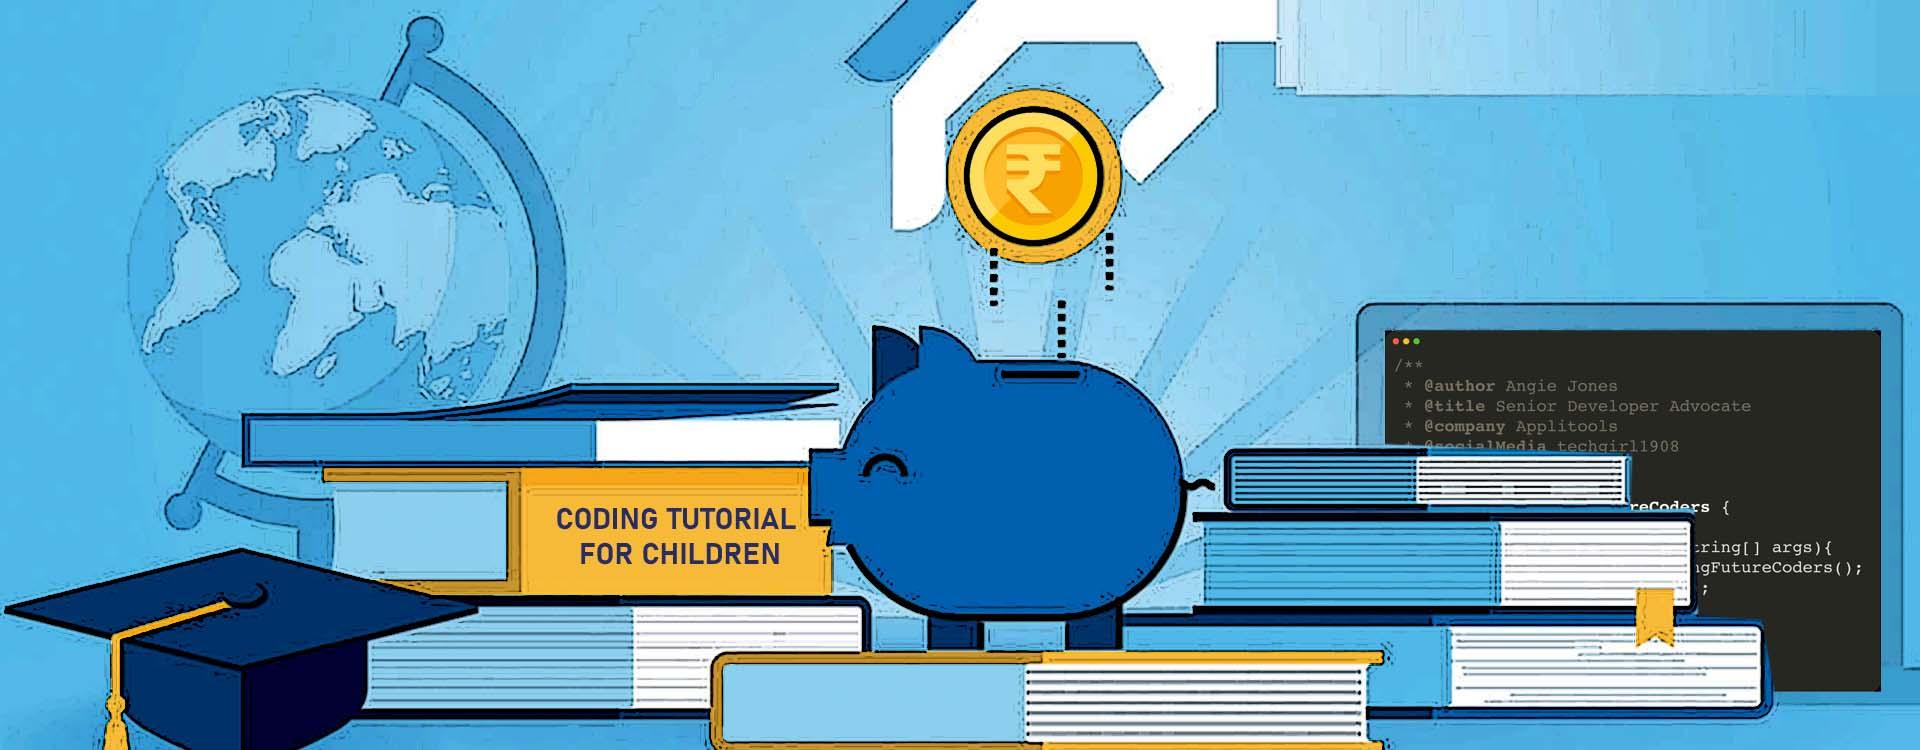 Pedagogy an EdTech startup revolutionalising preparation for exams